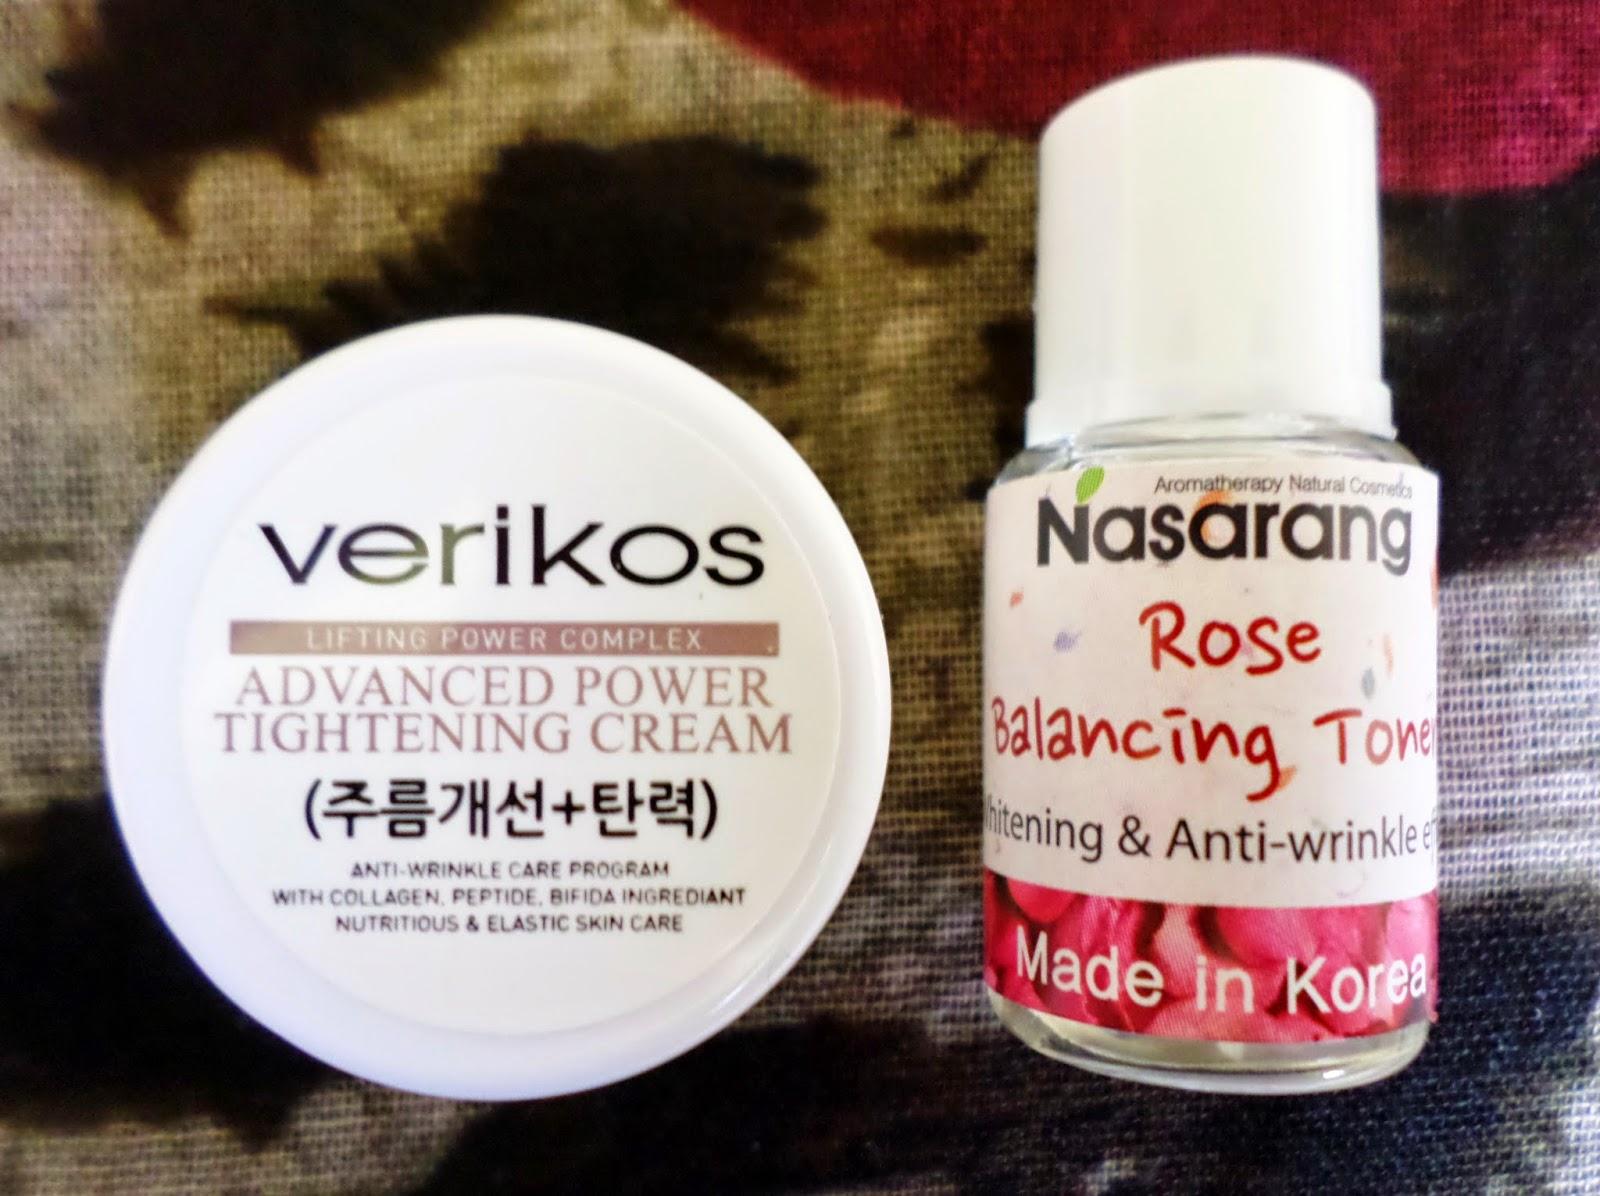 Nasarang Rose Balancing Toner and Verikos Advanced Power Tightening Cream  MEME Skincare Box